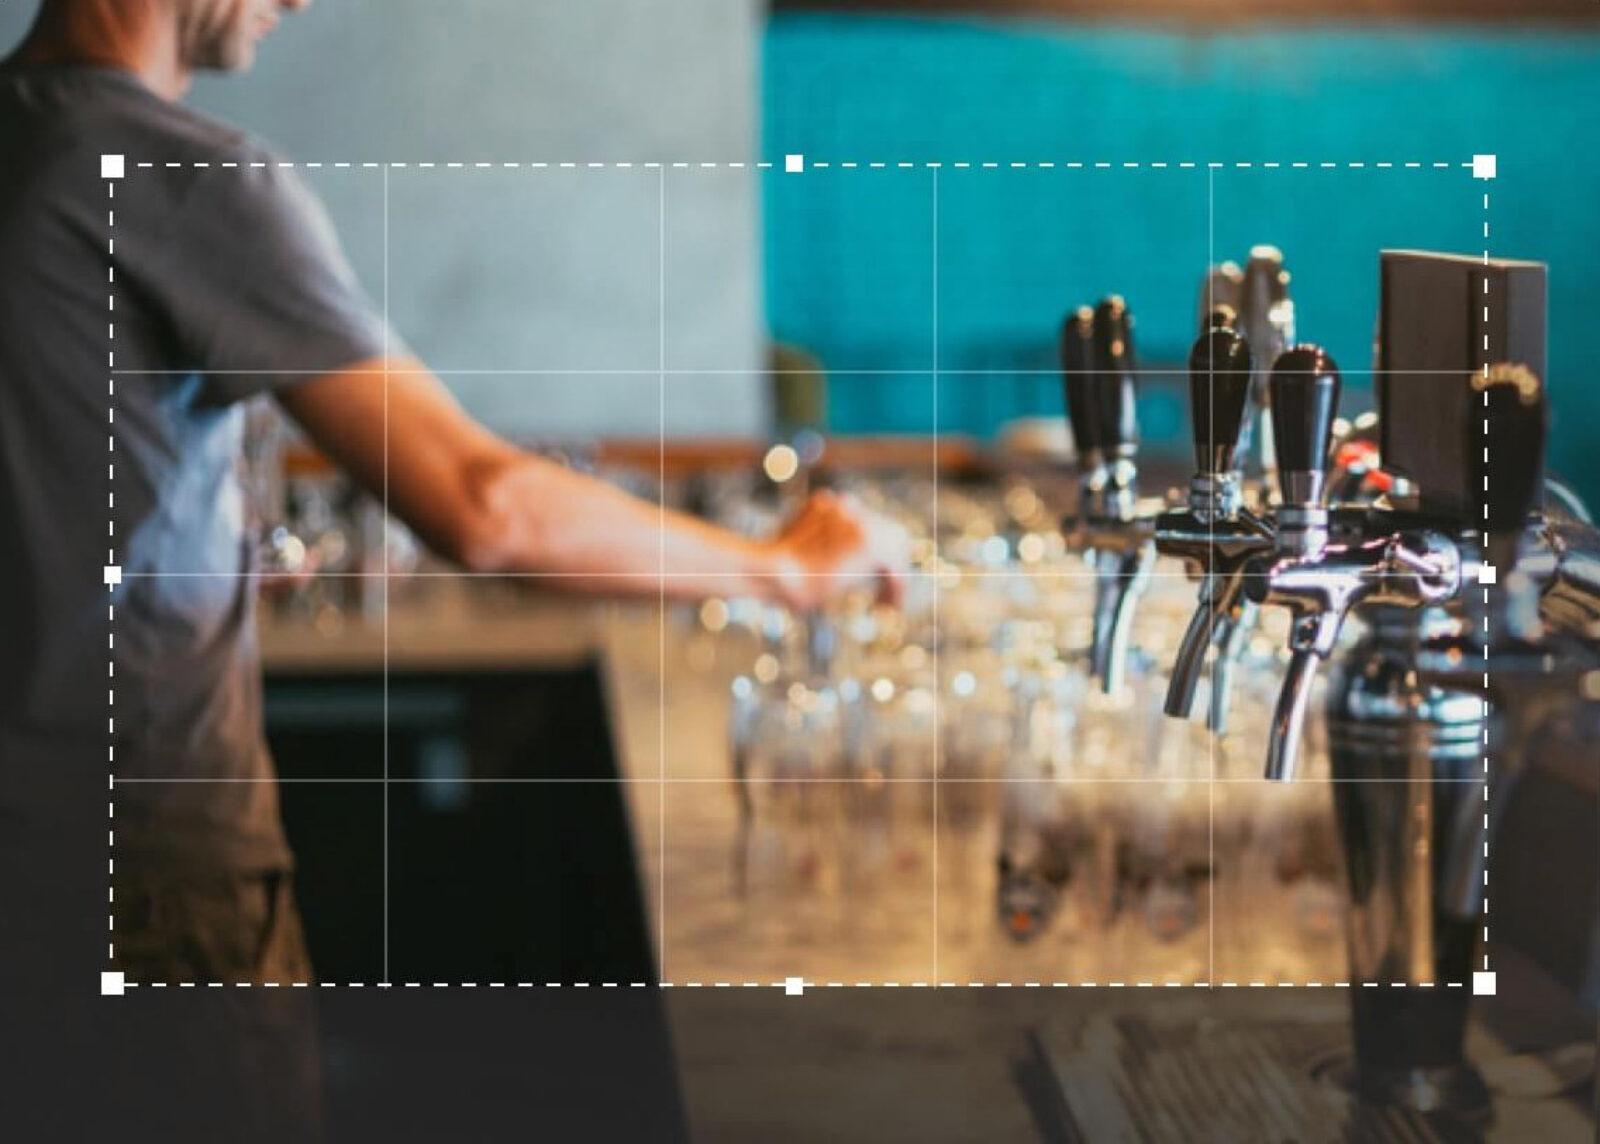 image-processing.jpg#asset:264:articleImages